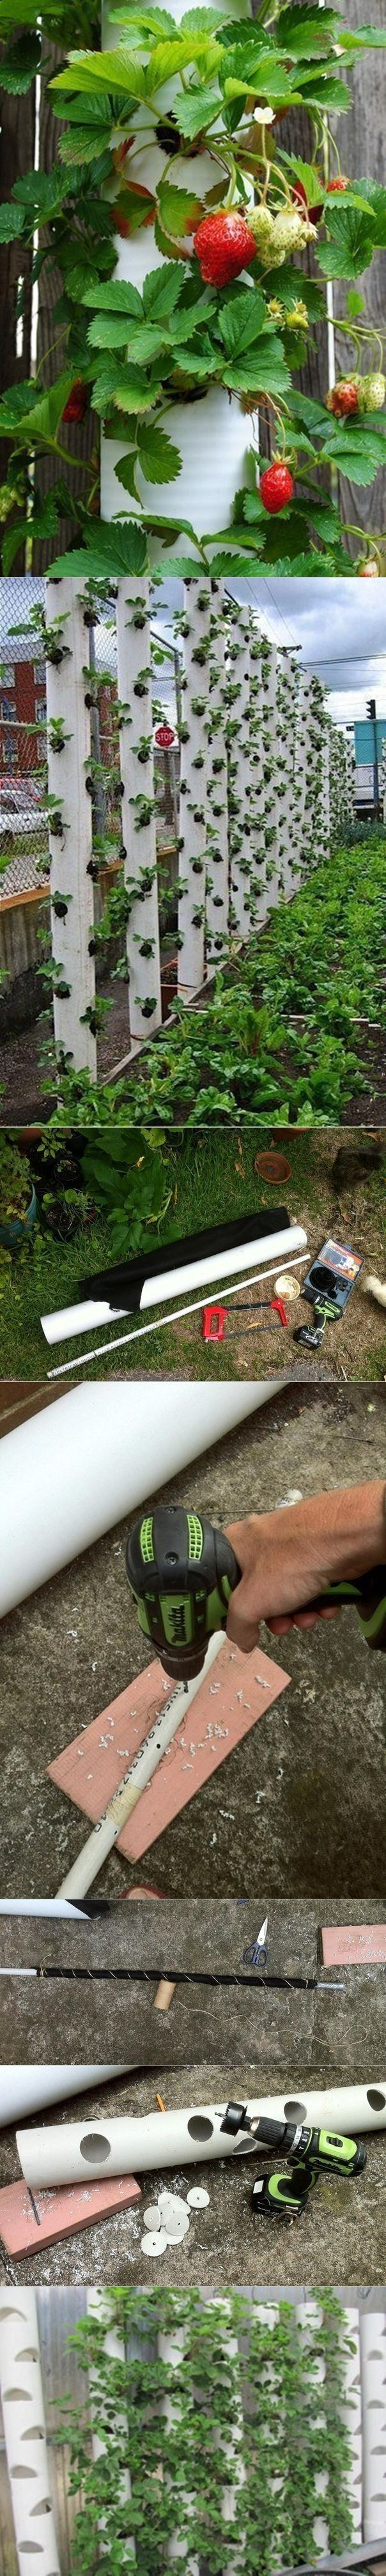 DIY Verticle PVC Pipe Strawberry Planter Tower | www.FabArtDIY.com LIKE Us on Facebook ==> https://www.facebook.com/FabArtDIY: